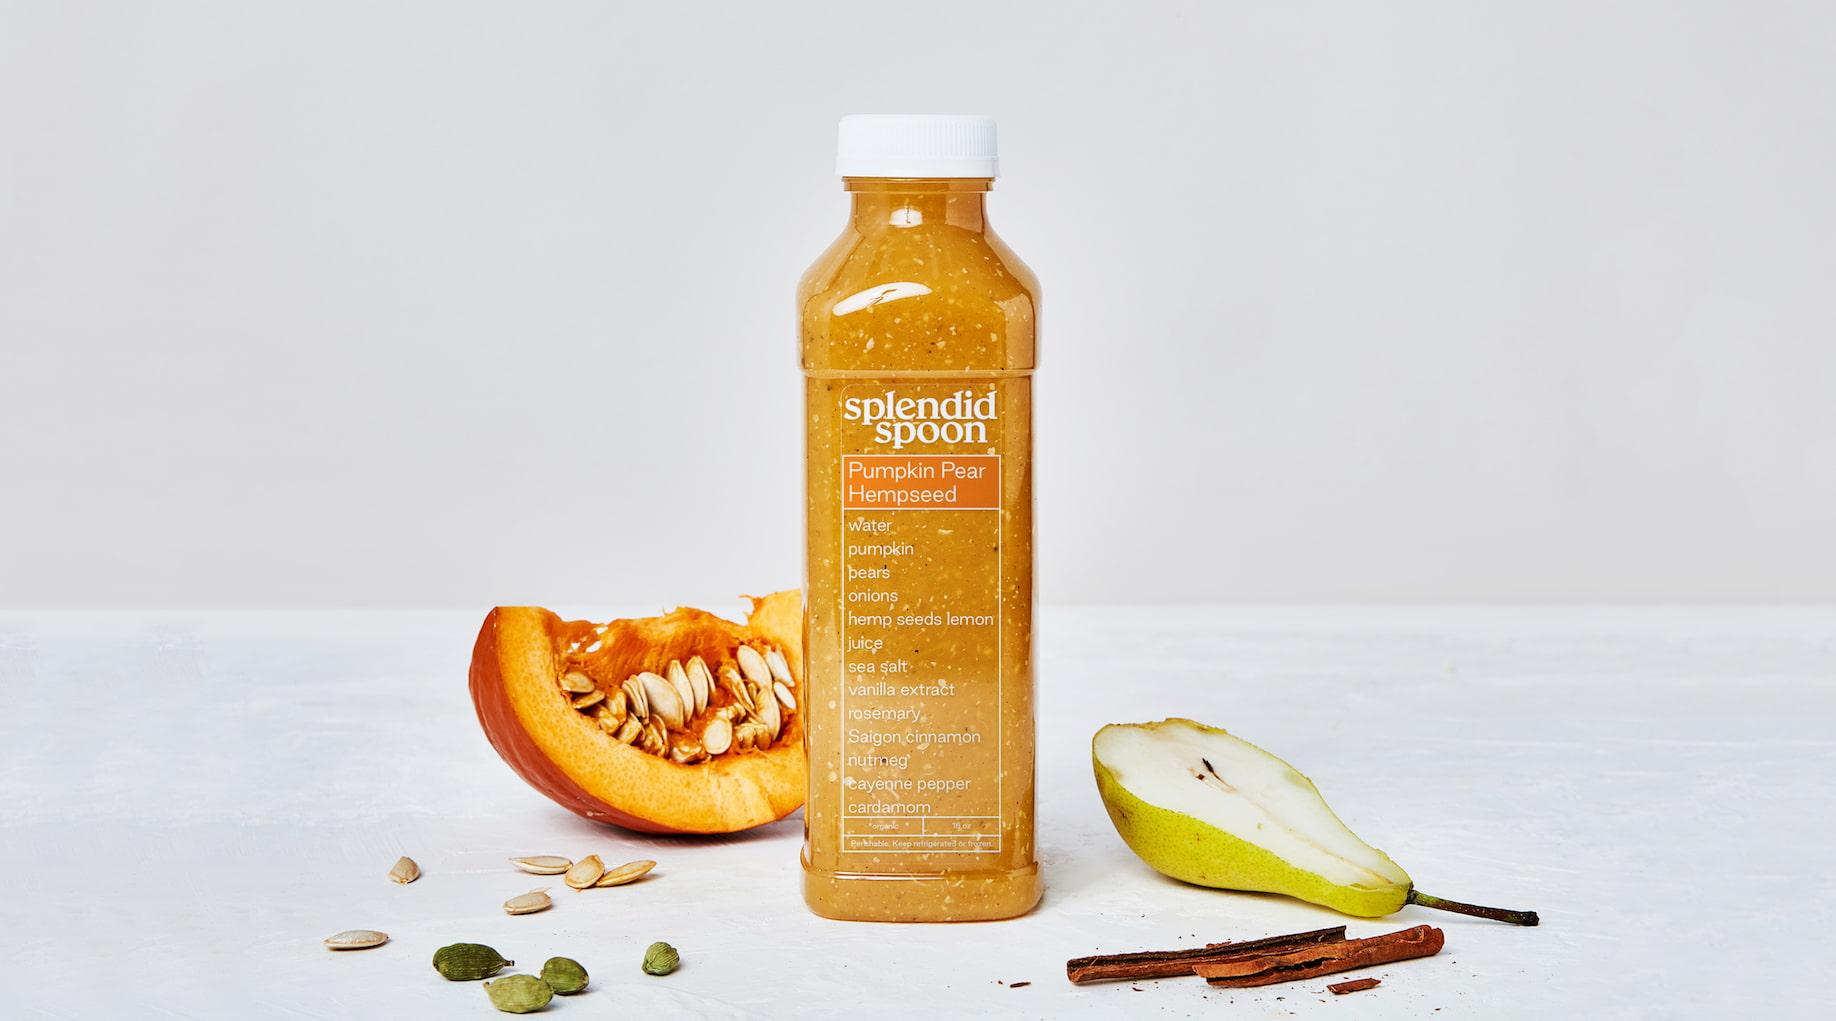 Pumpkin Pear Hempseed